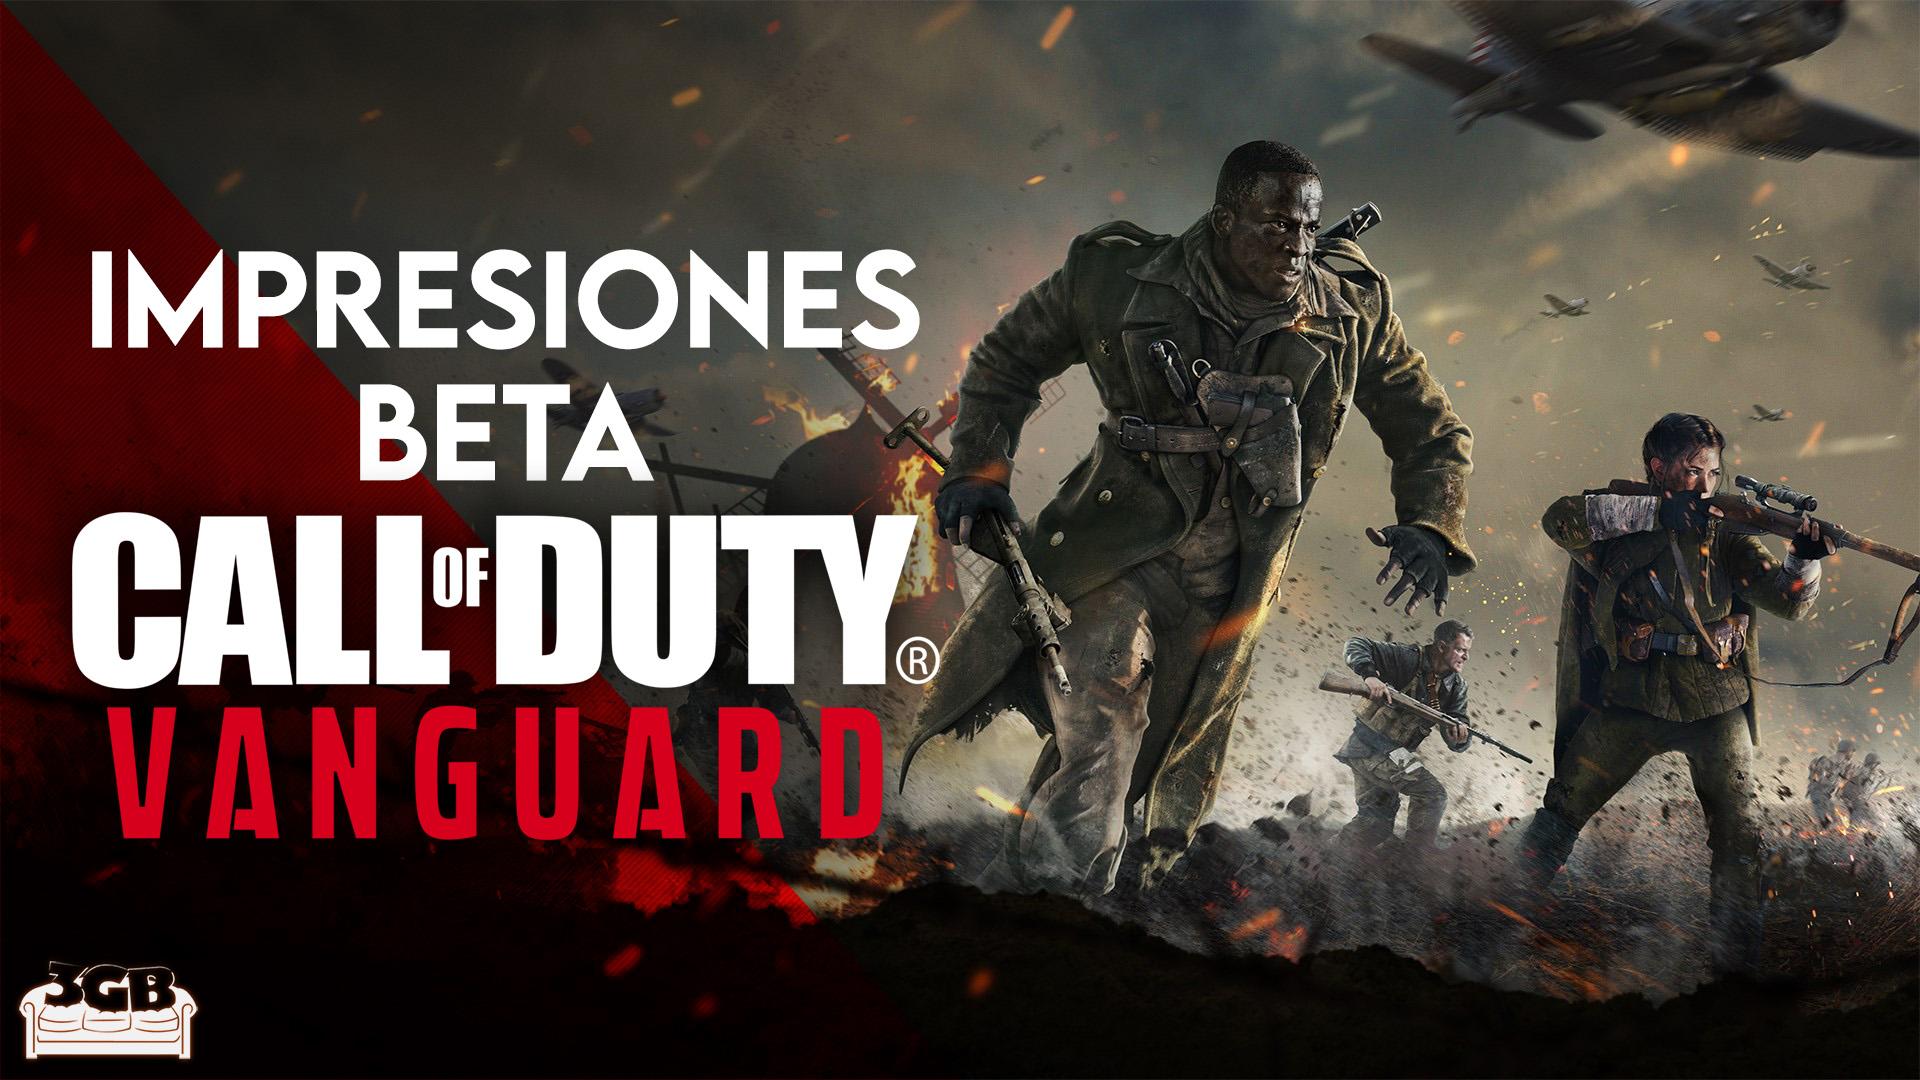 Impresiones Beta Call of Duty: Vanguard